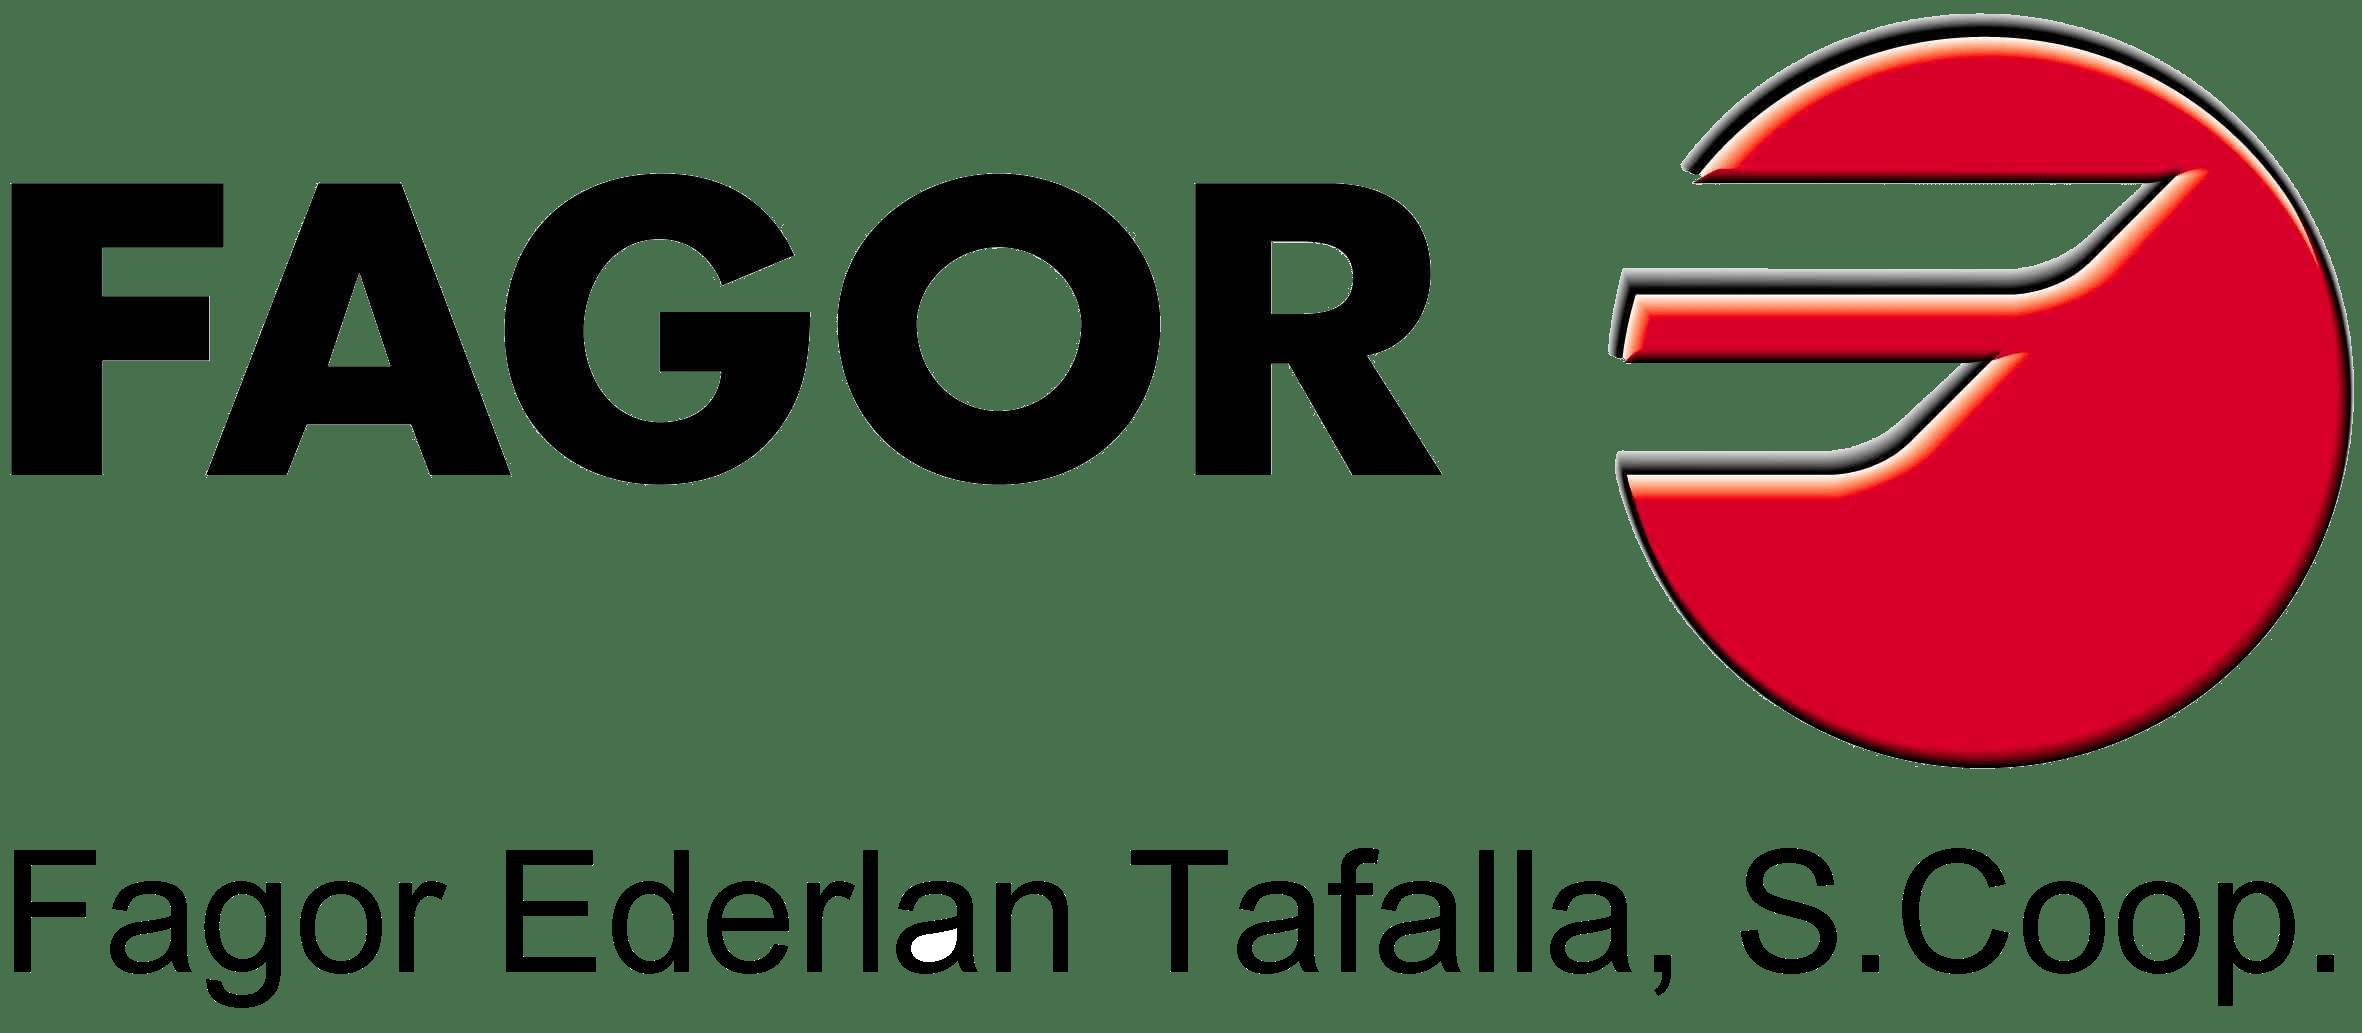 fagor-ederlan-tafalla3